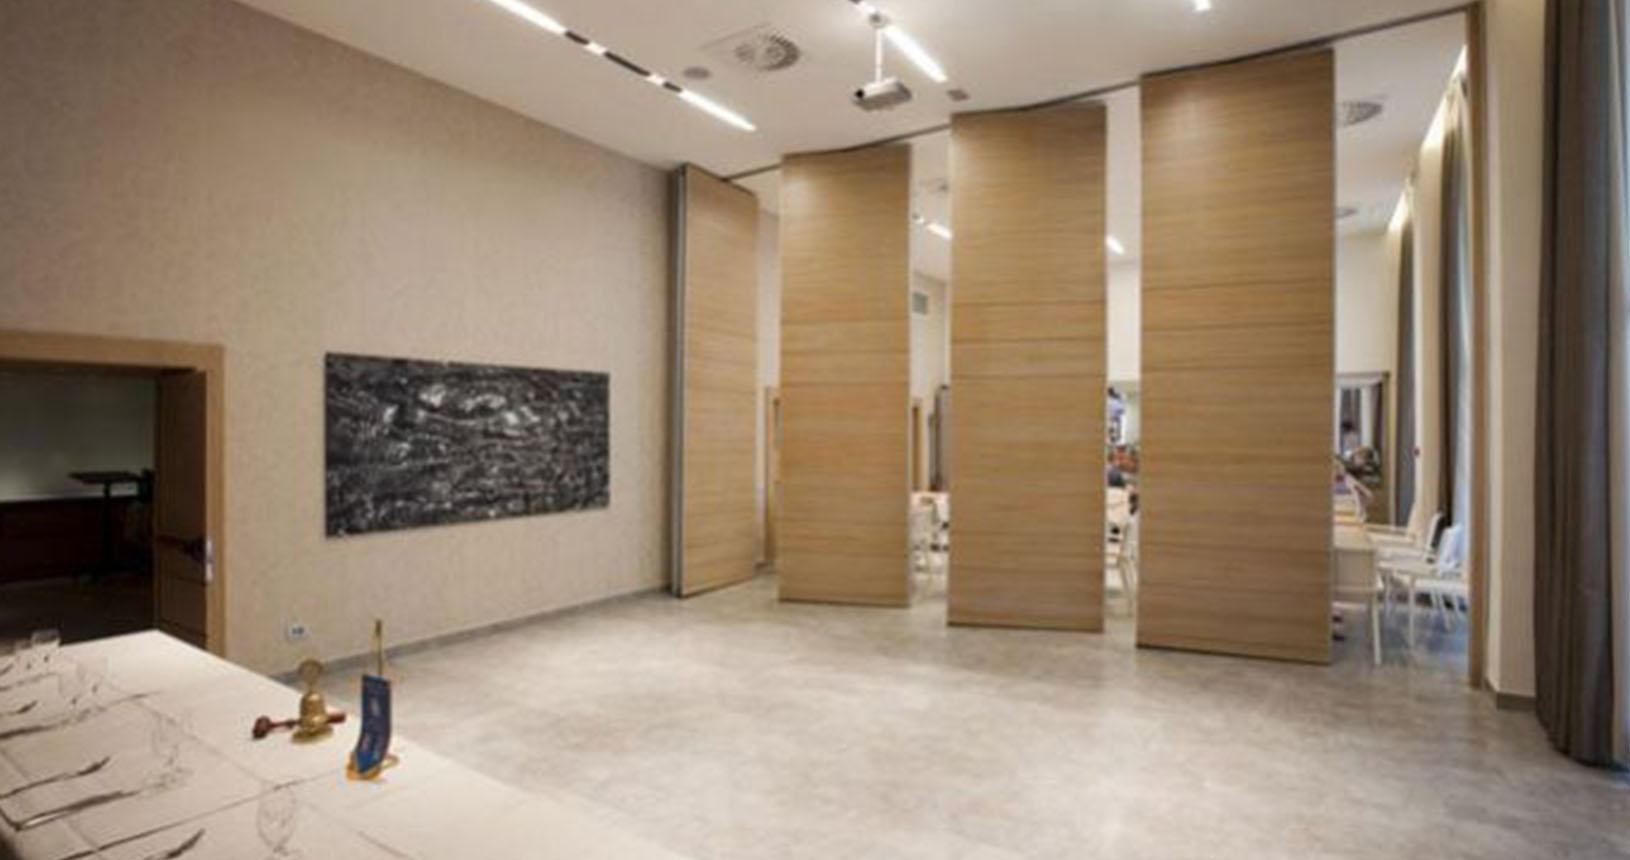 Pannelli fonoassorbenti pareti manovrabili cagliari e - Pannelli decorativi fonoassorbenti ...